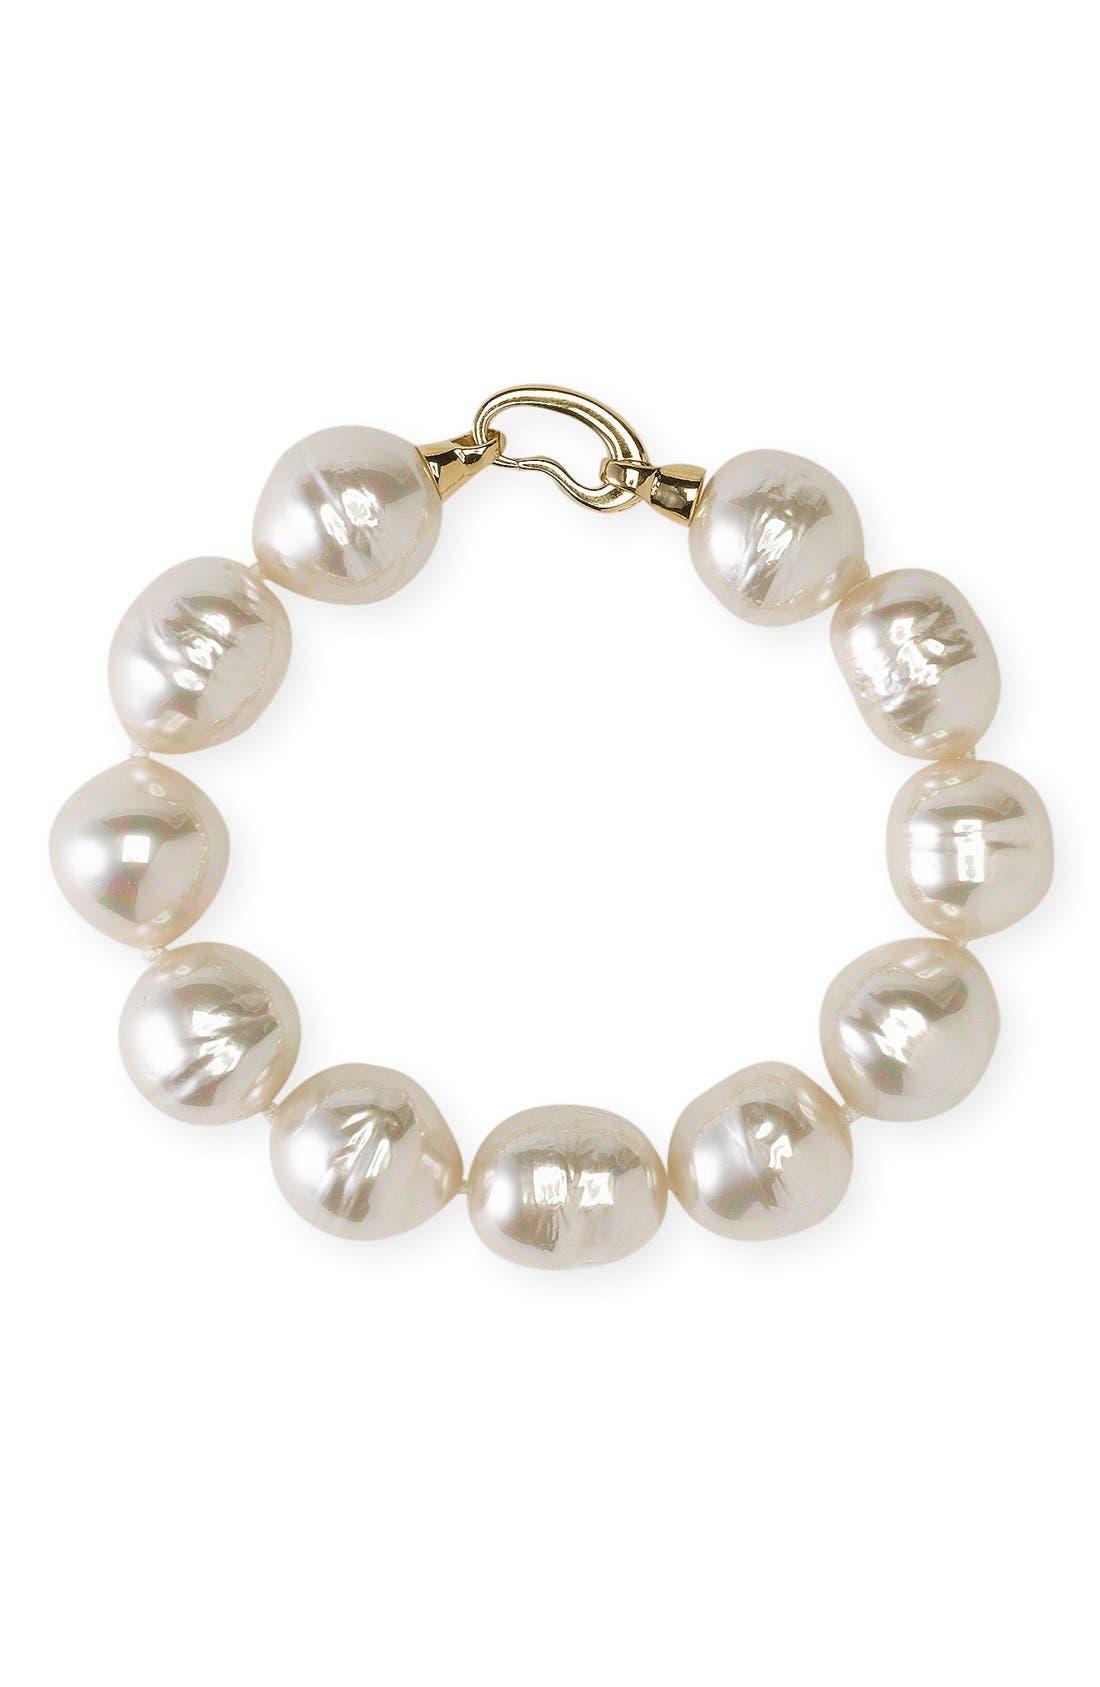 Main Image - Majorica 14mm Baroque Pearl Single Row Bracelet